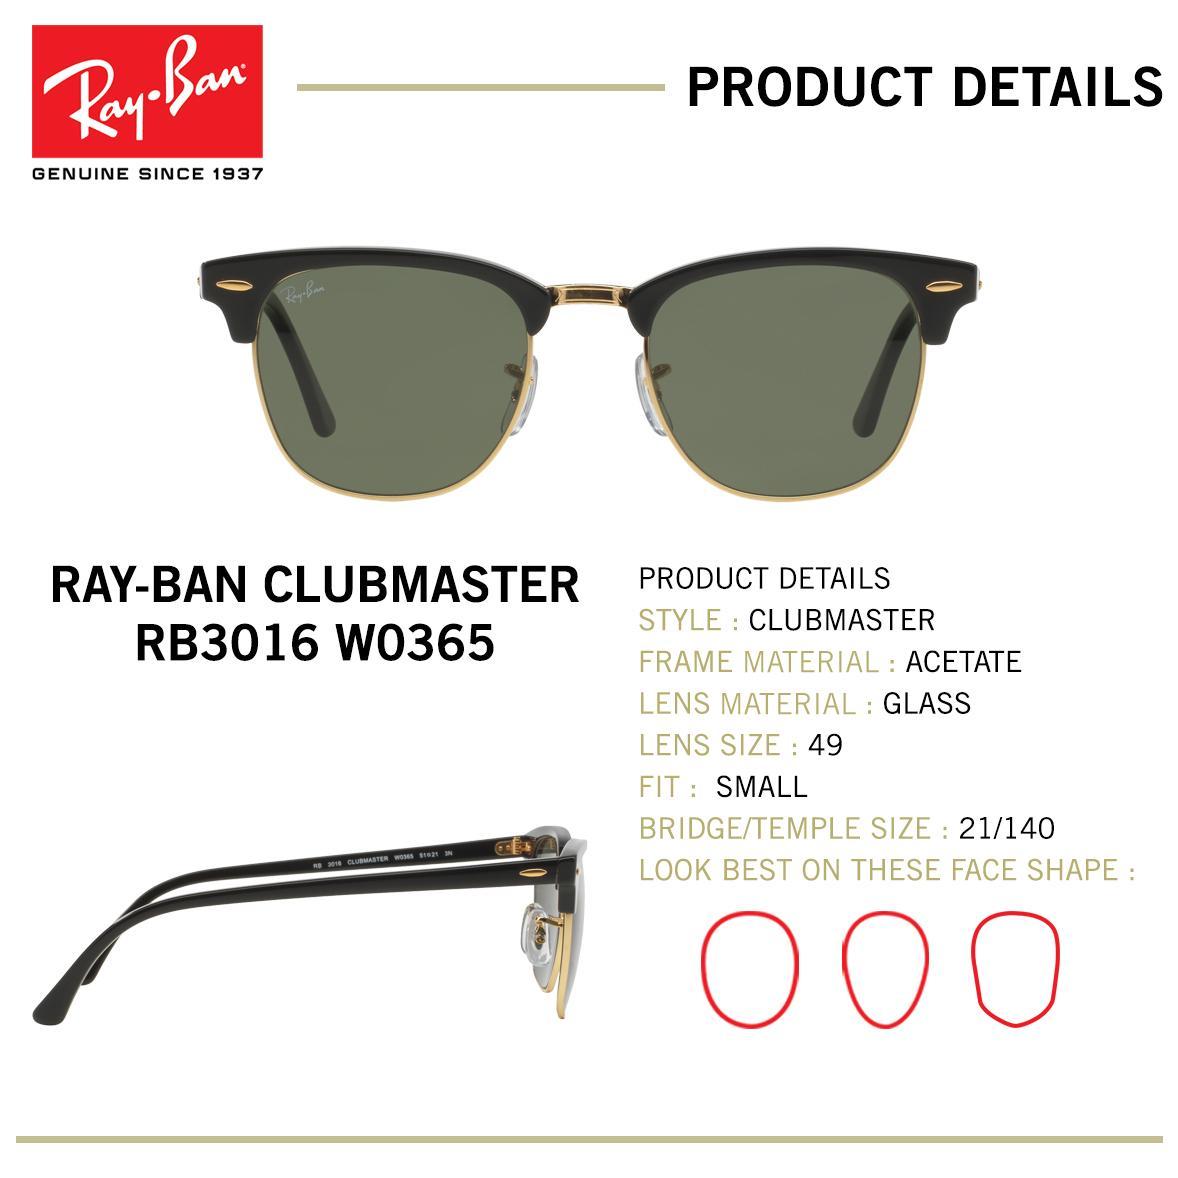 Ray-Ban Sunglasses Clubmaster RB3016 - Ebony/ Arista (W0365) Size 49 ...